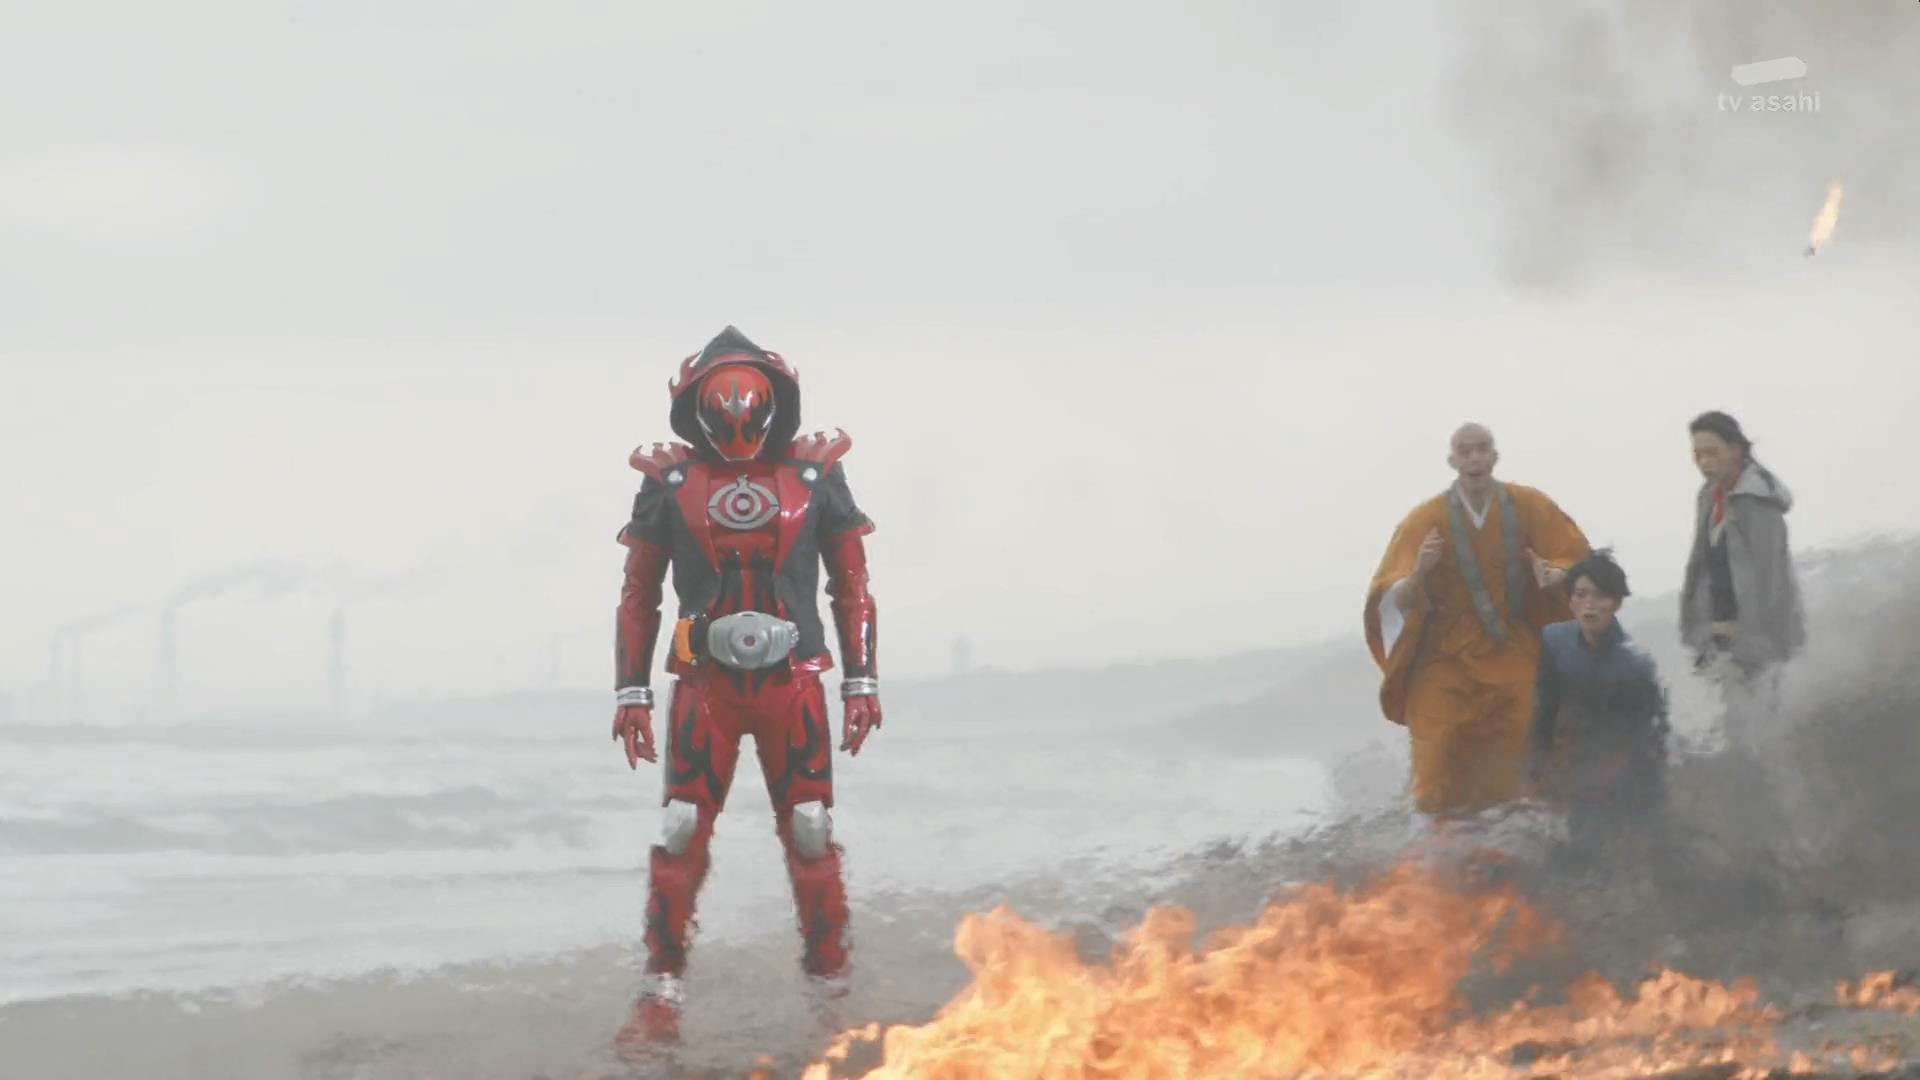 Kamen rider kuuga episode 12 - Project x movie gallery